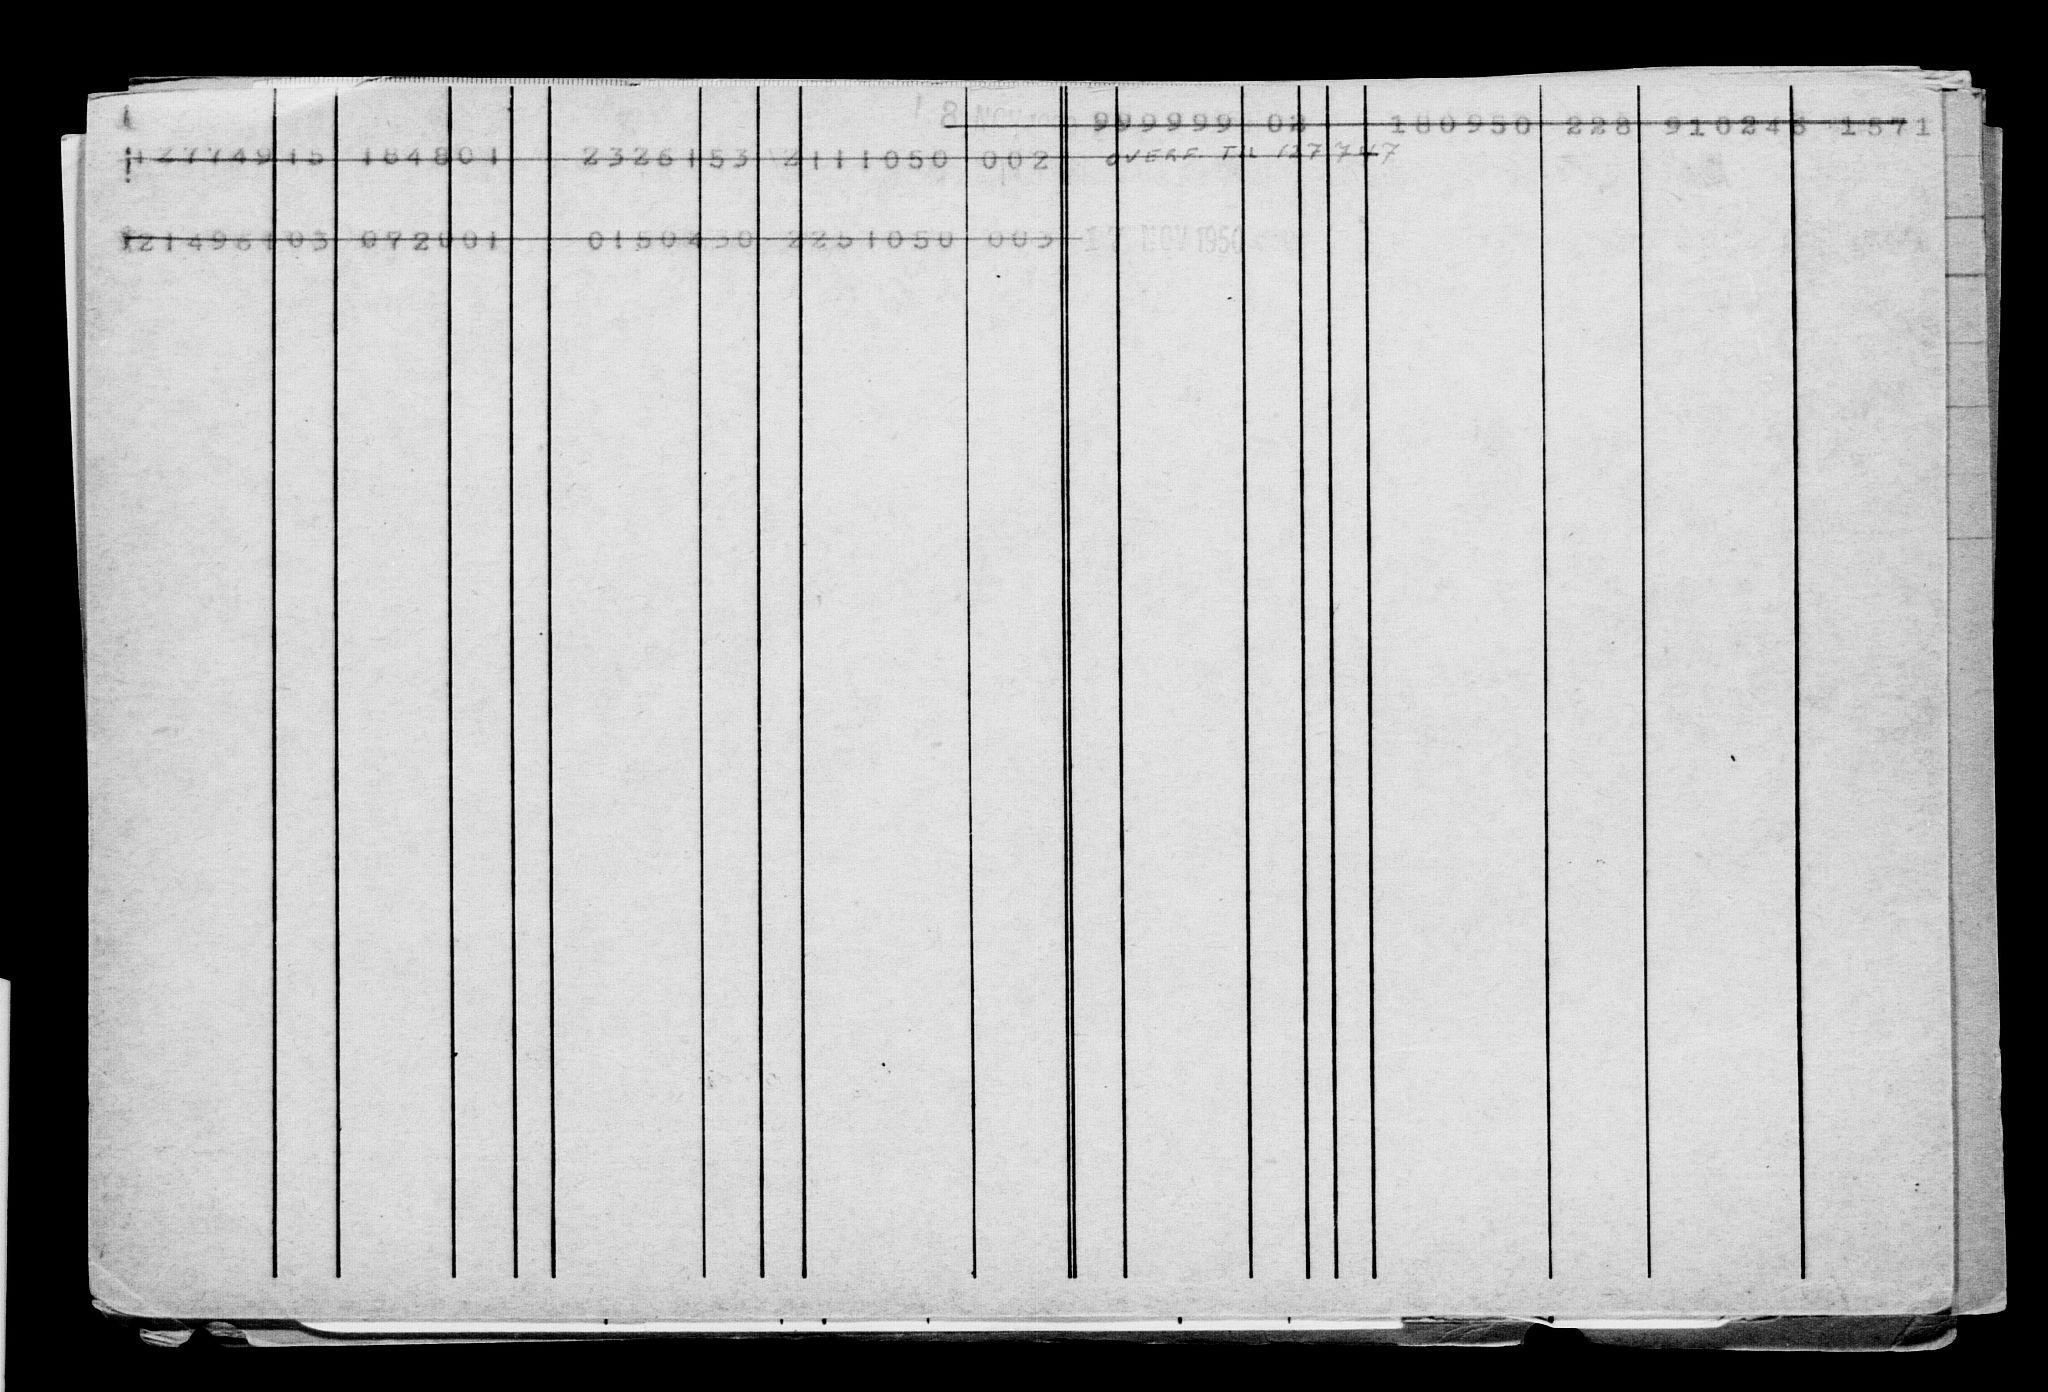 RA, Direktoratet for sjømenn, G/Gb/L0005: Hovedkort, 1888, p. 370